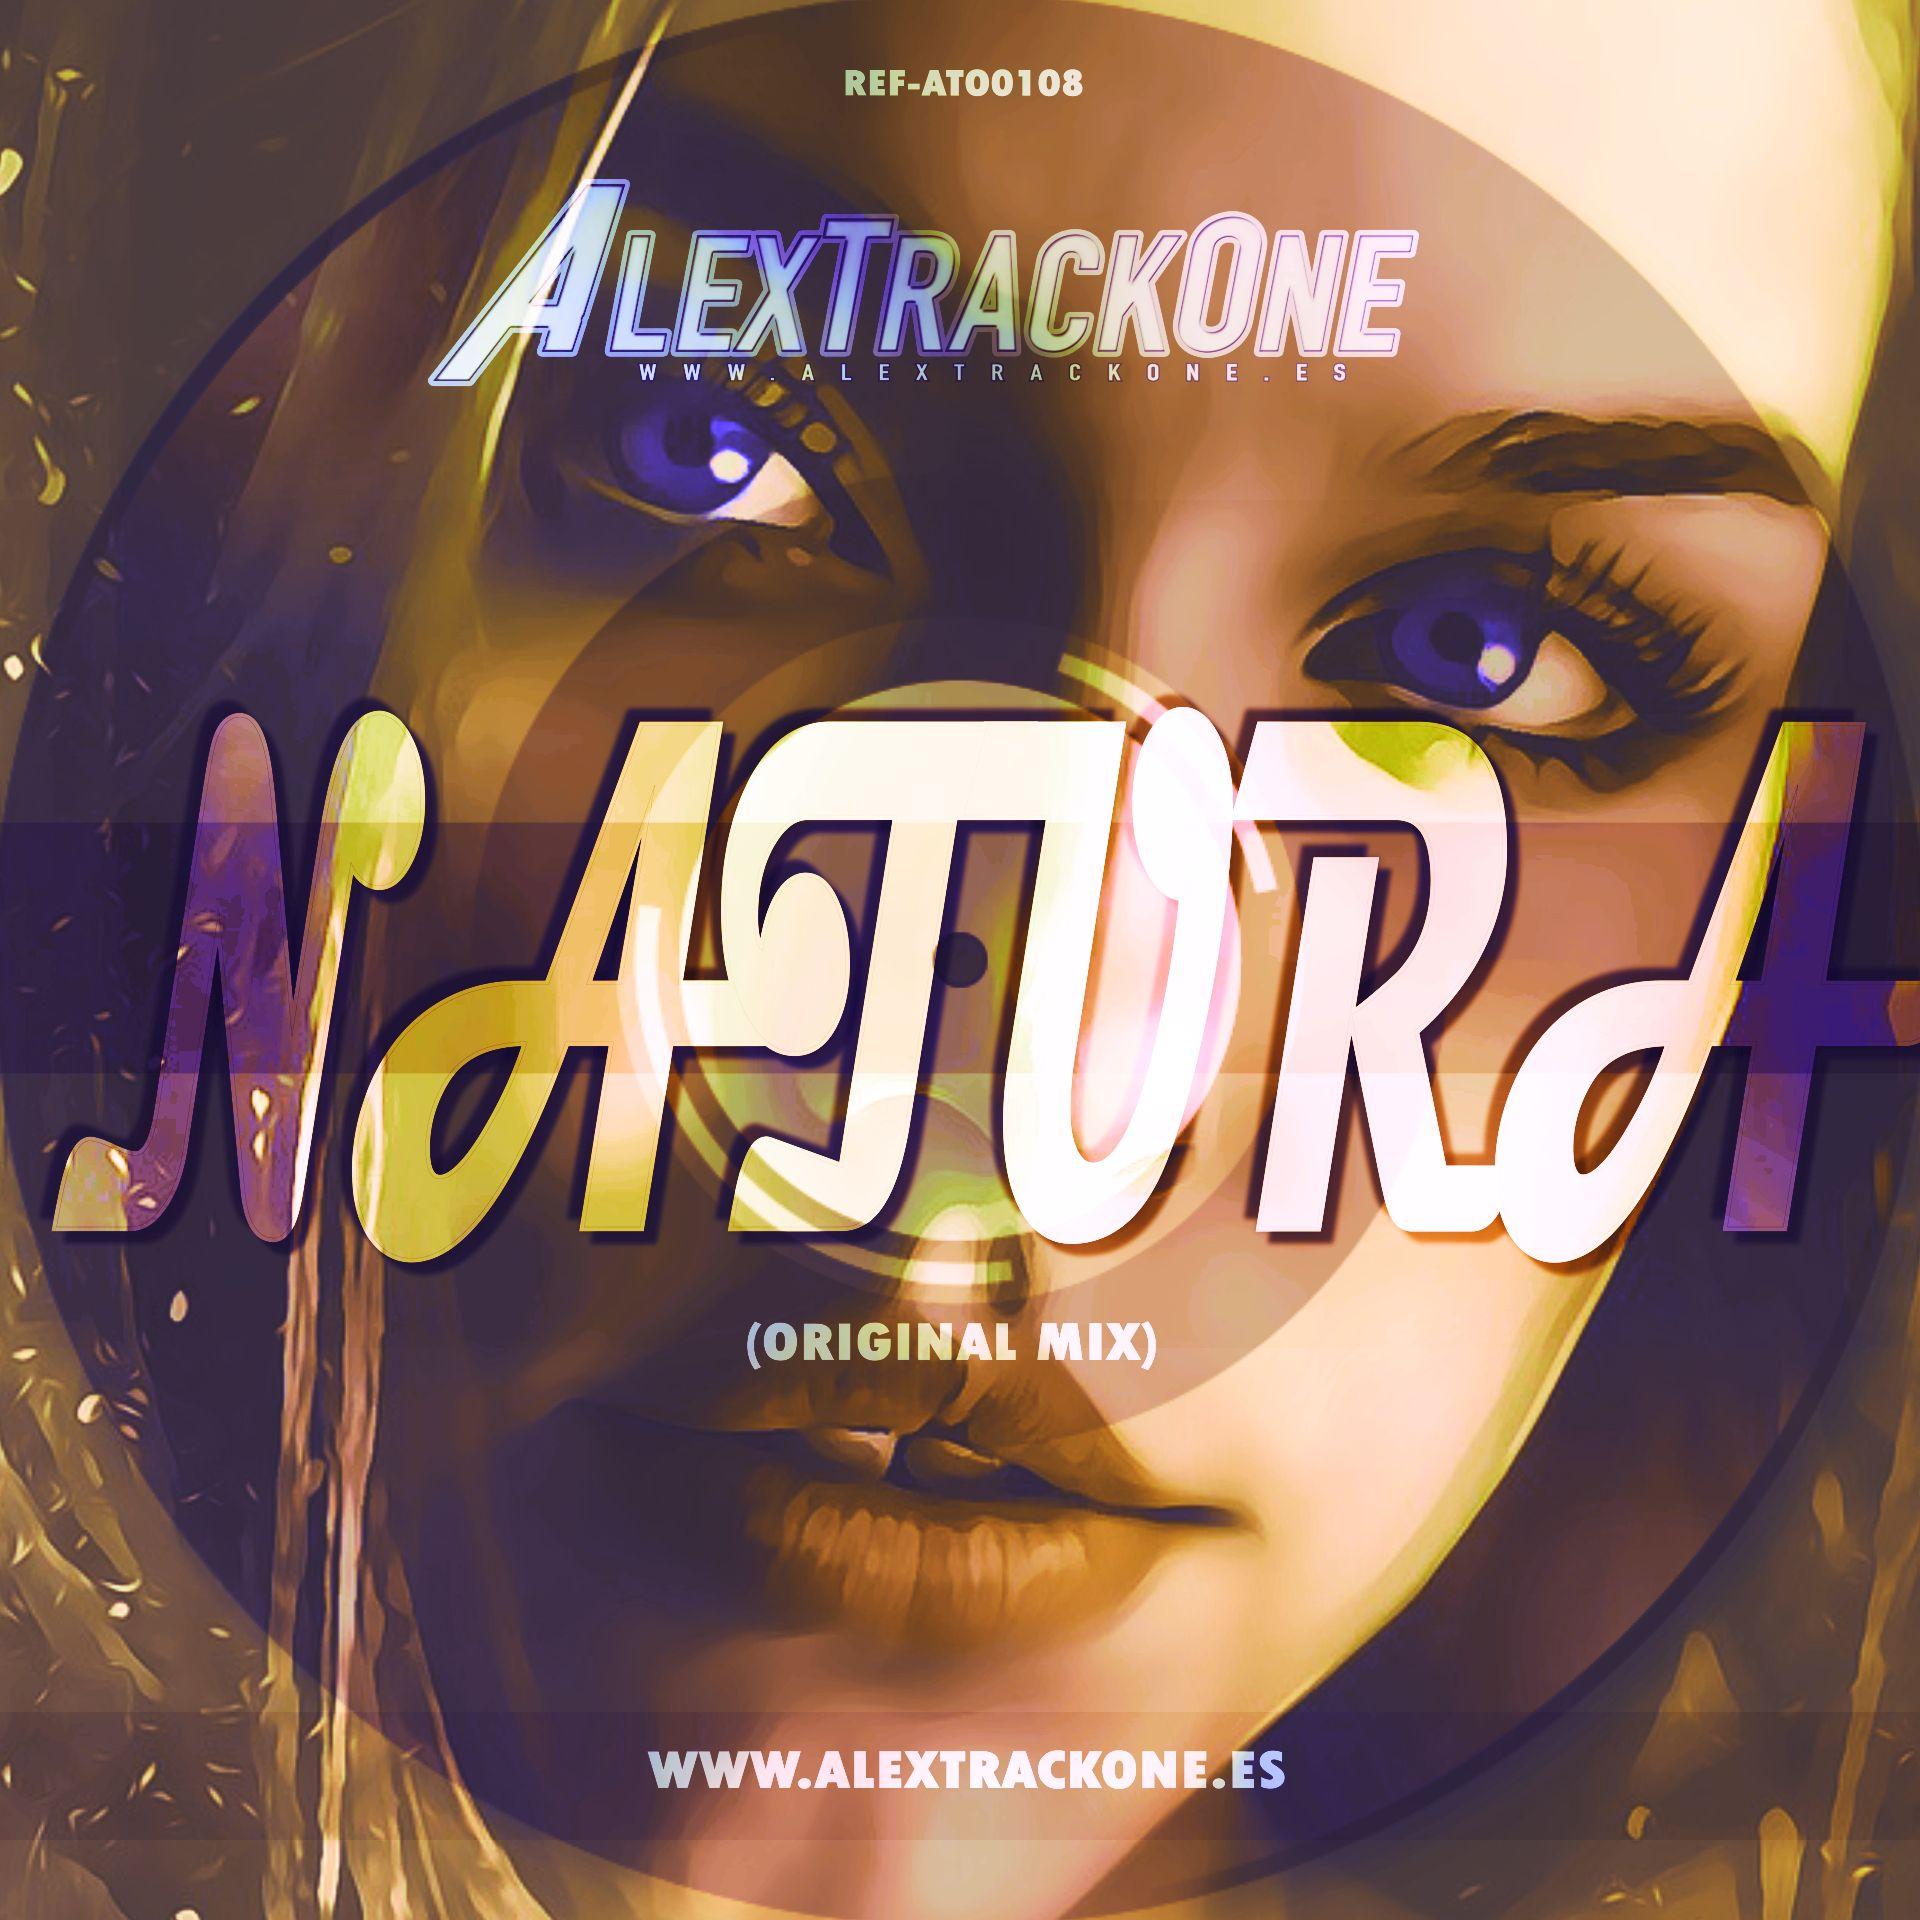 REF-ATO0108 NATURA (ORIGINAL MIX) (MP3 & WAV & FLAC)